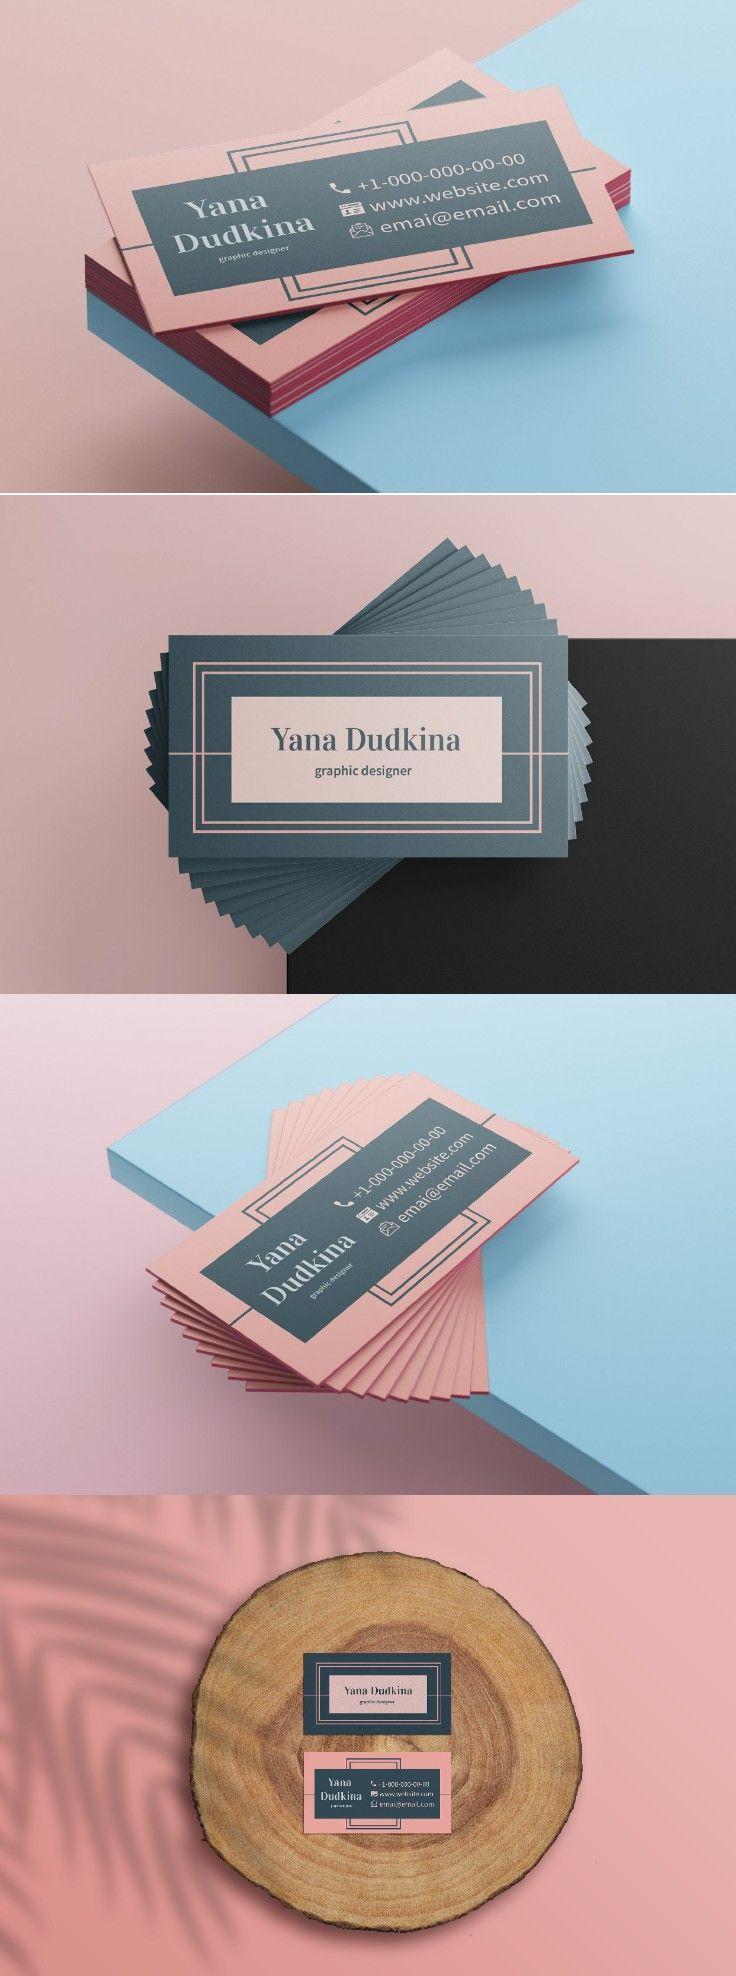 Business Card Template Beauty Business Card Template Pink Etsy Business Cards Diy Templates Beauty Business Cards Business Card Template